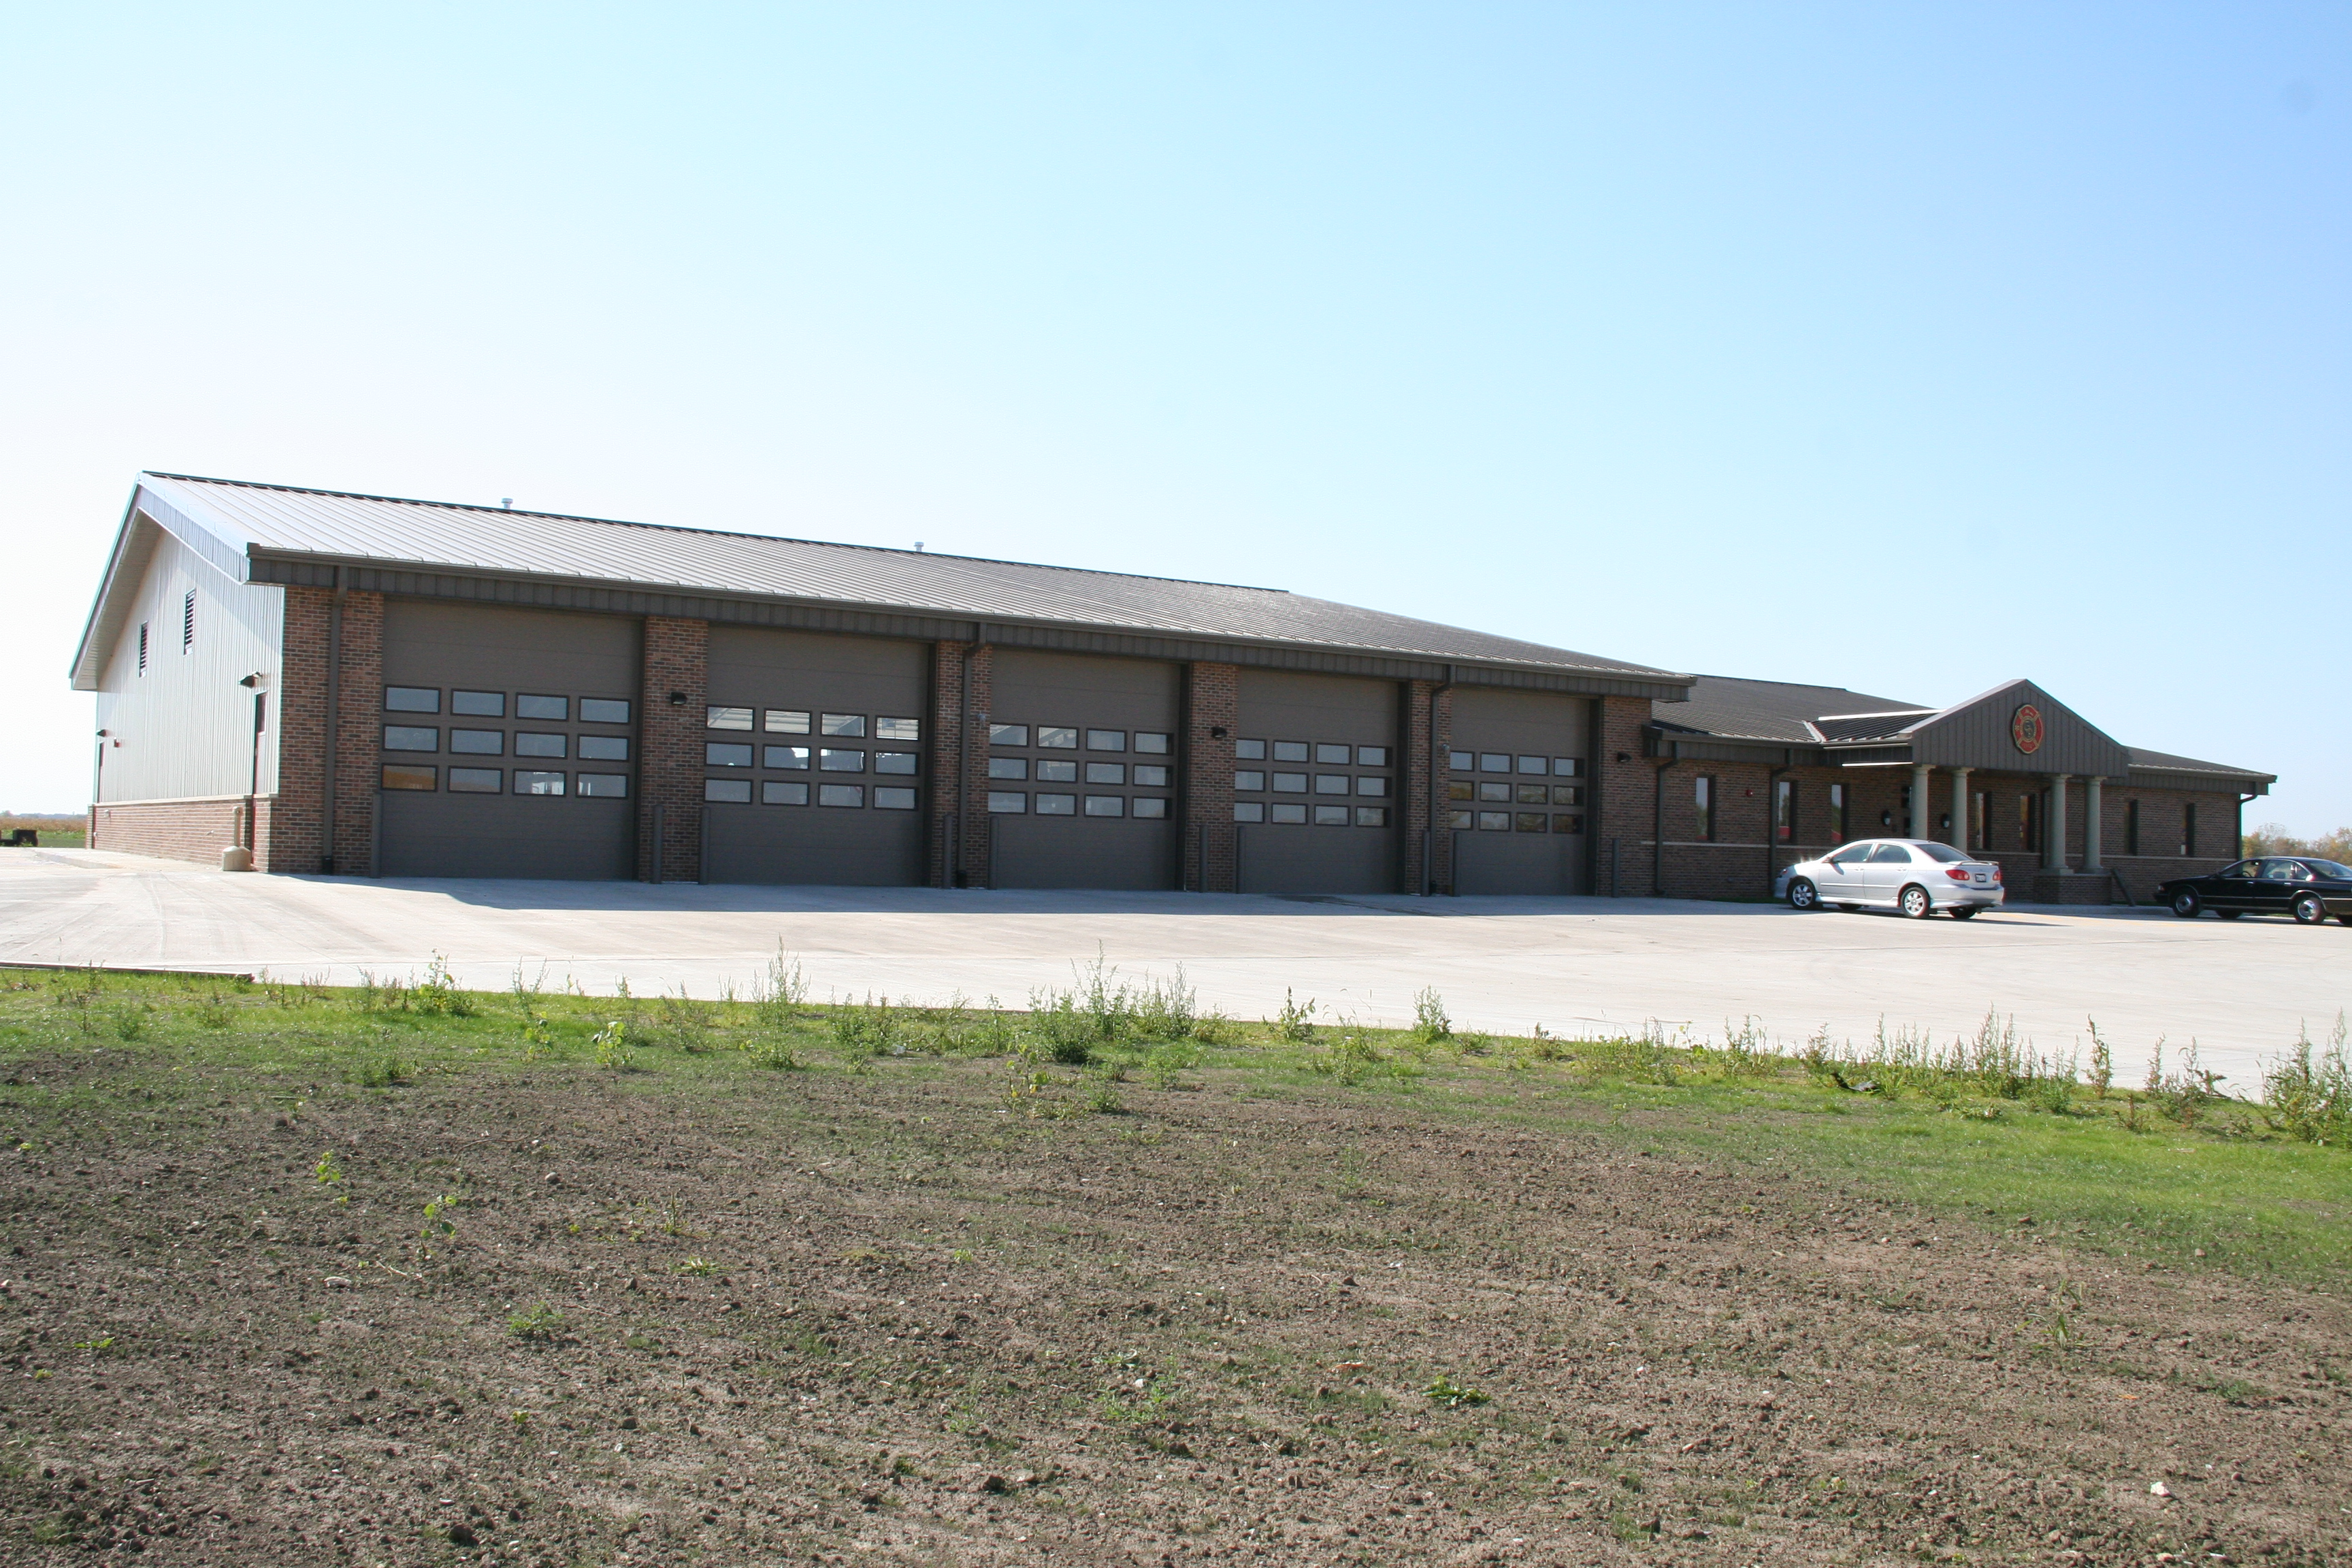 Grant Park Fire District Station 1